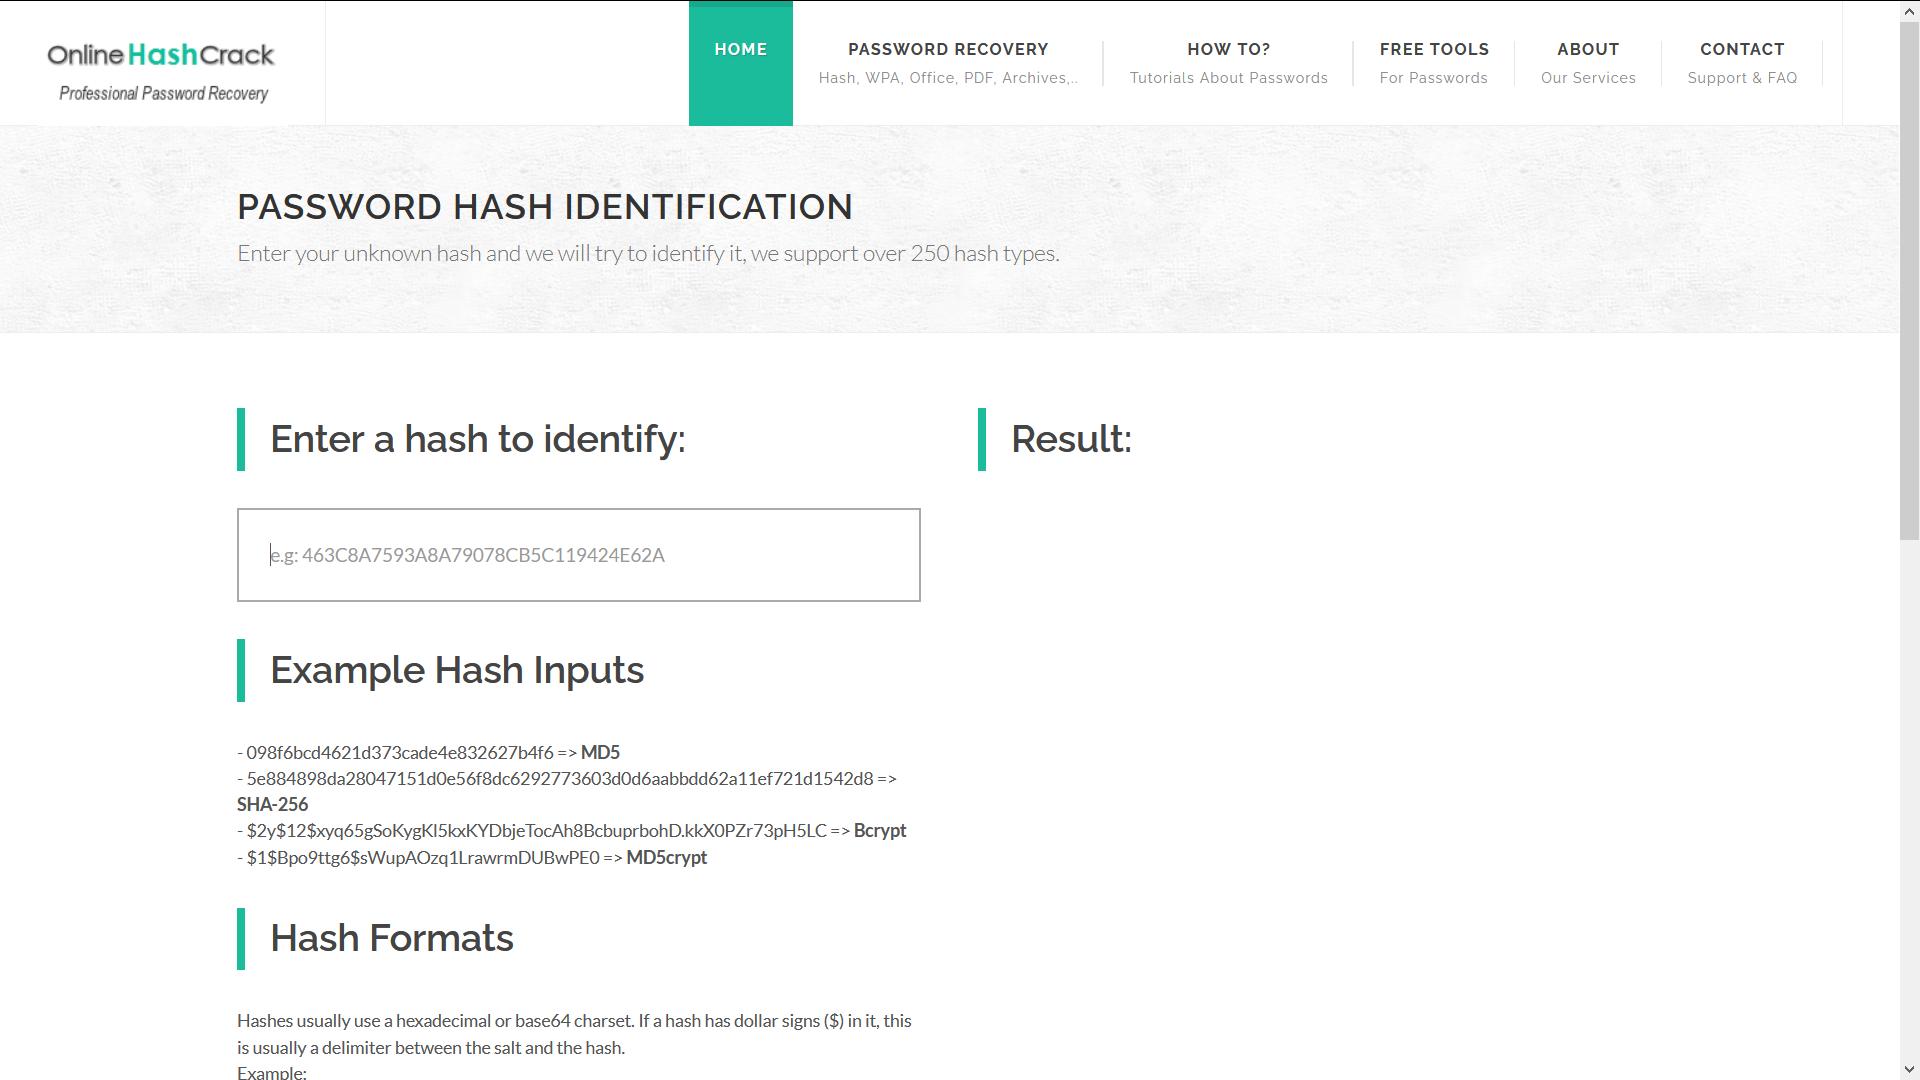 OnlineHashCracker-investigative-journalism-tool